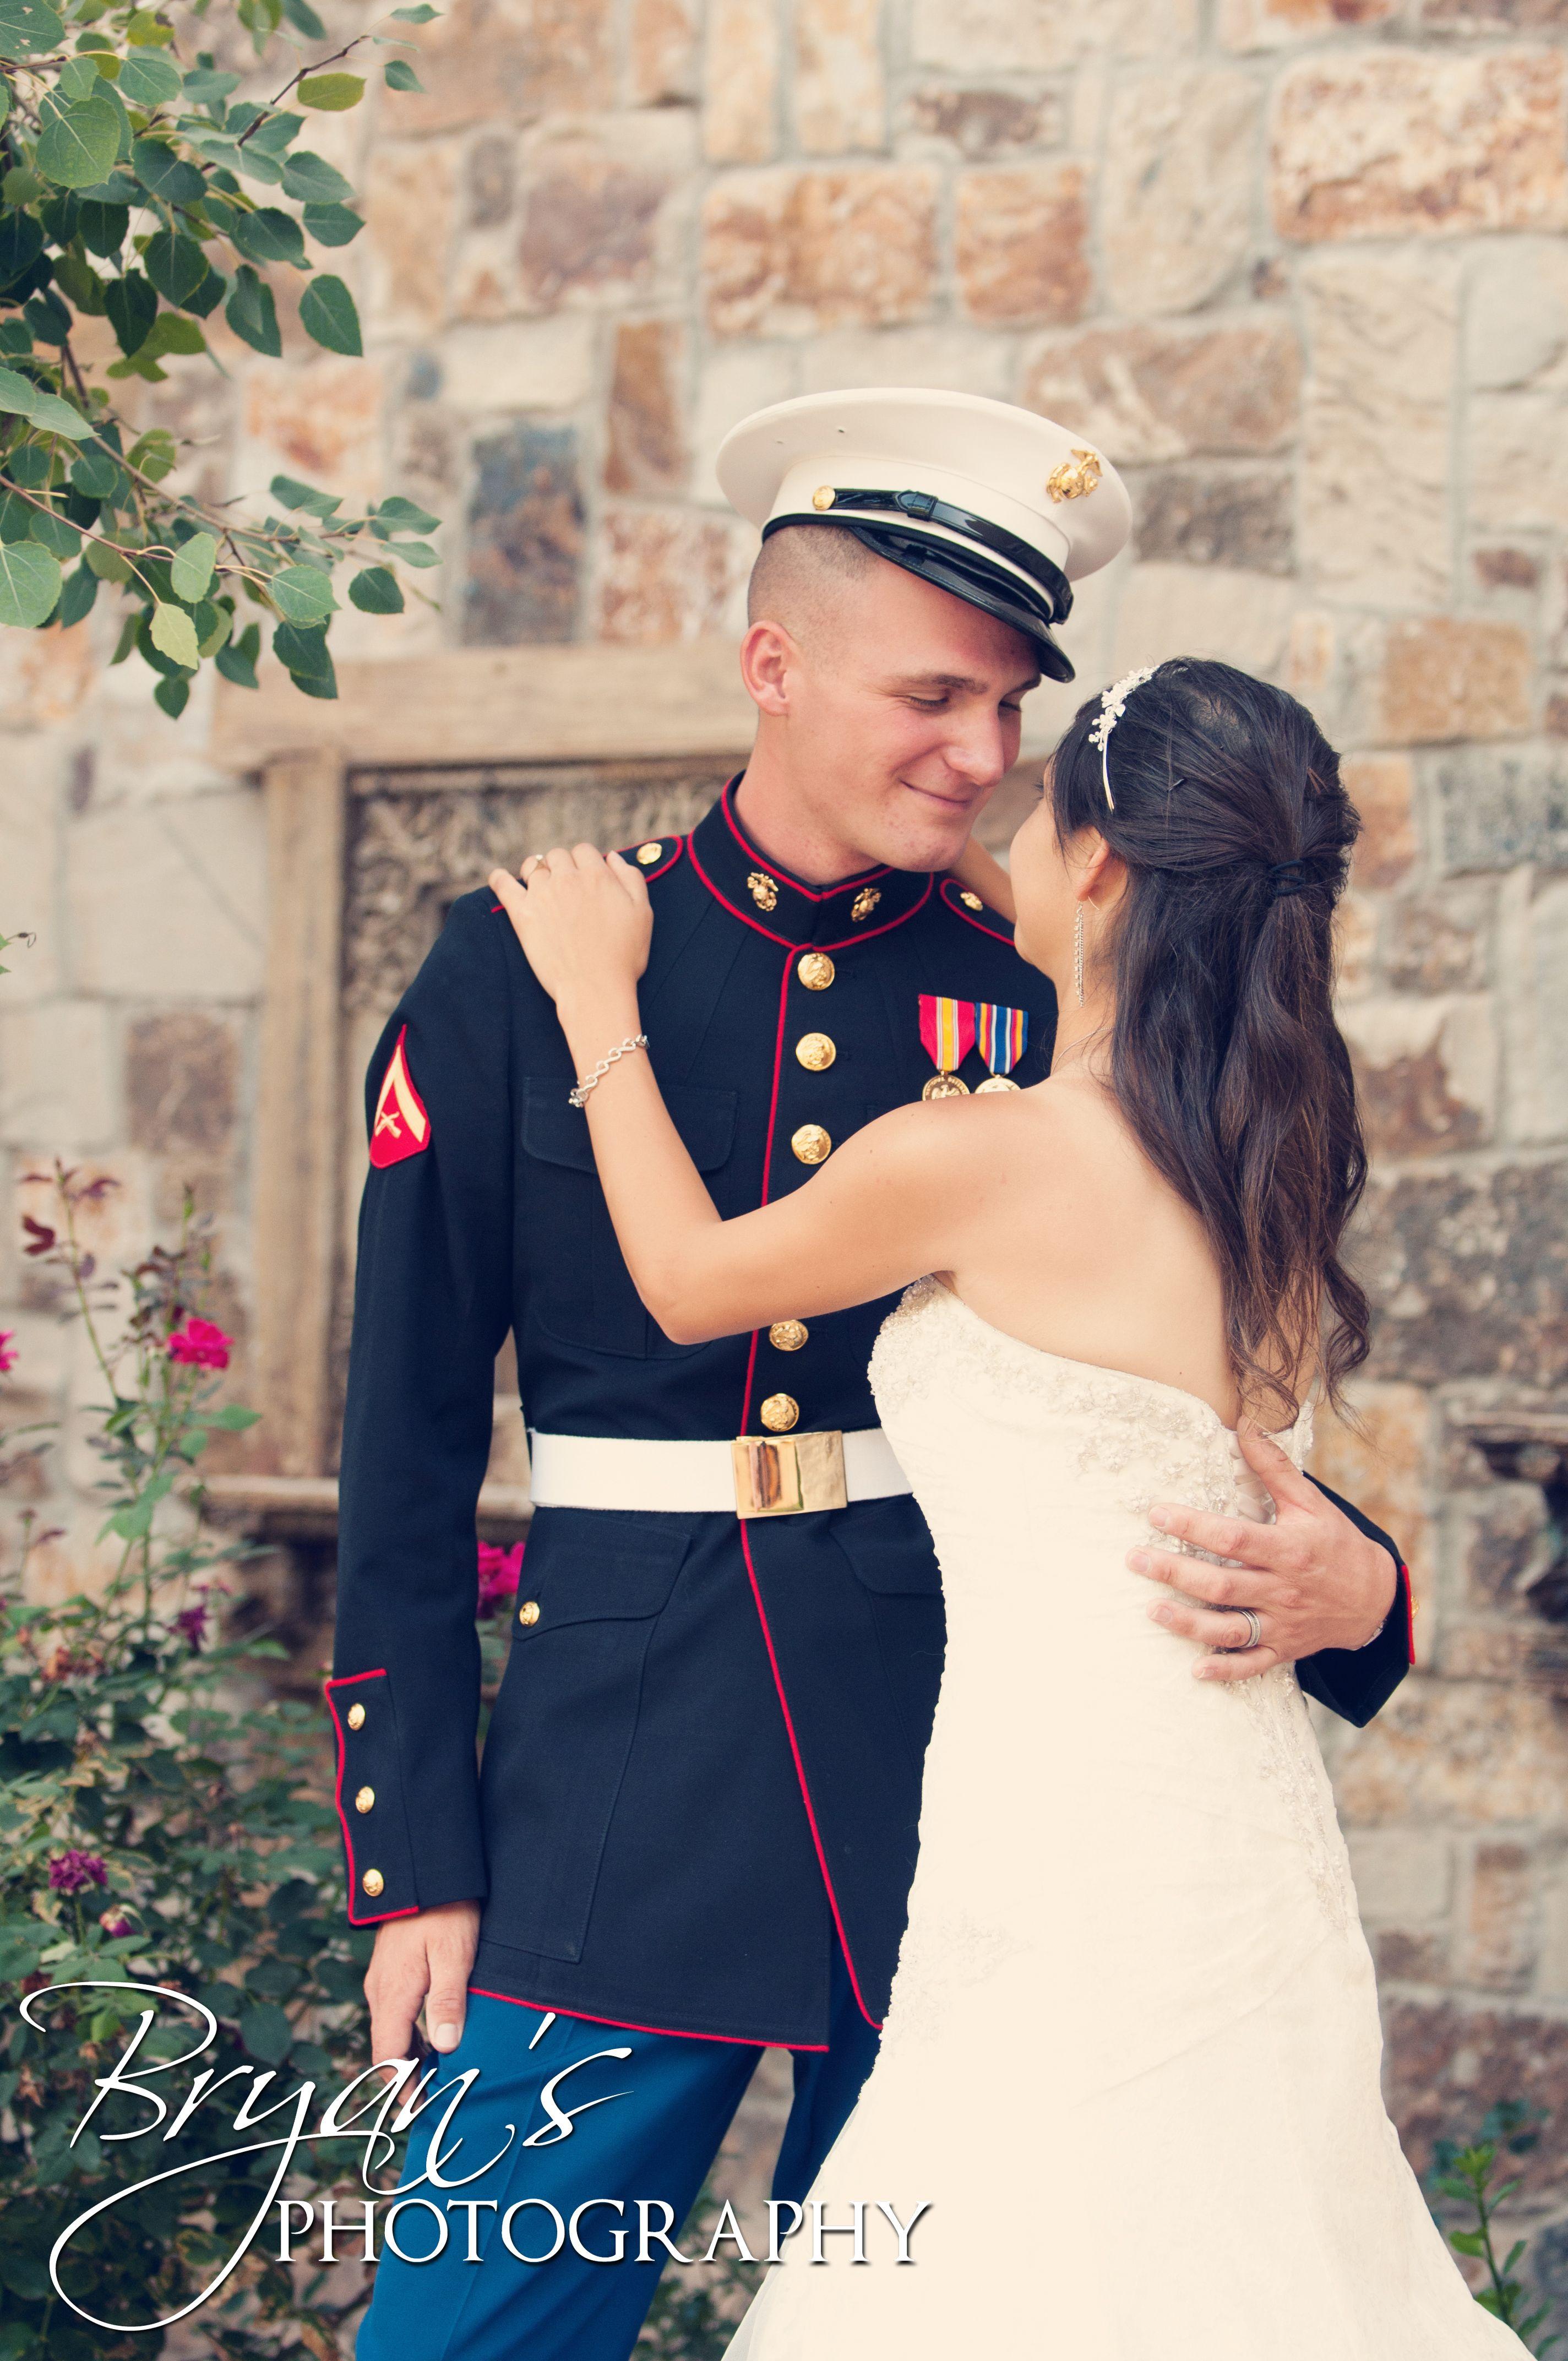 Bryan's Photography Albuquerque New Mexico Marine Wedding Couple Dressblues Love Abq: Marine Dress Blues Wedding At Reisefeber.org